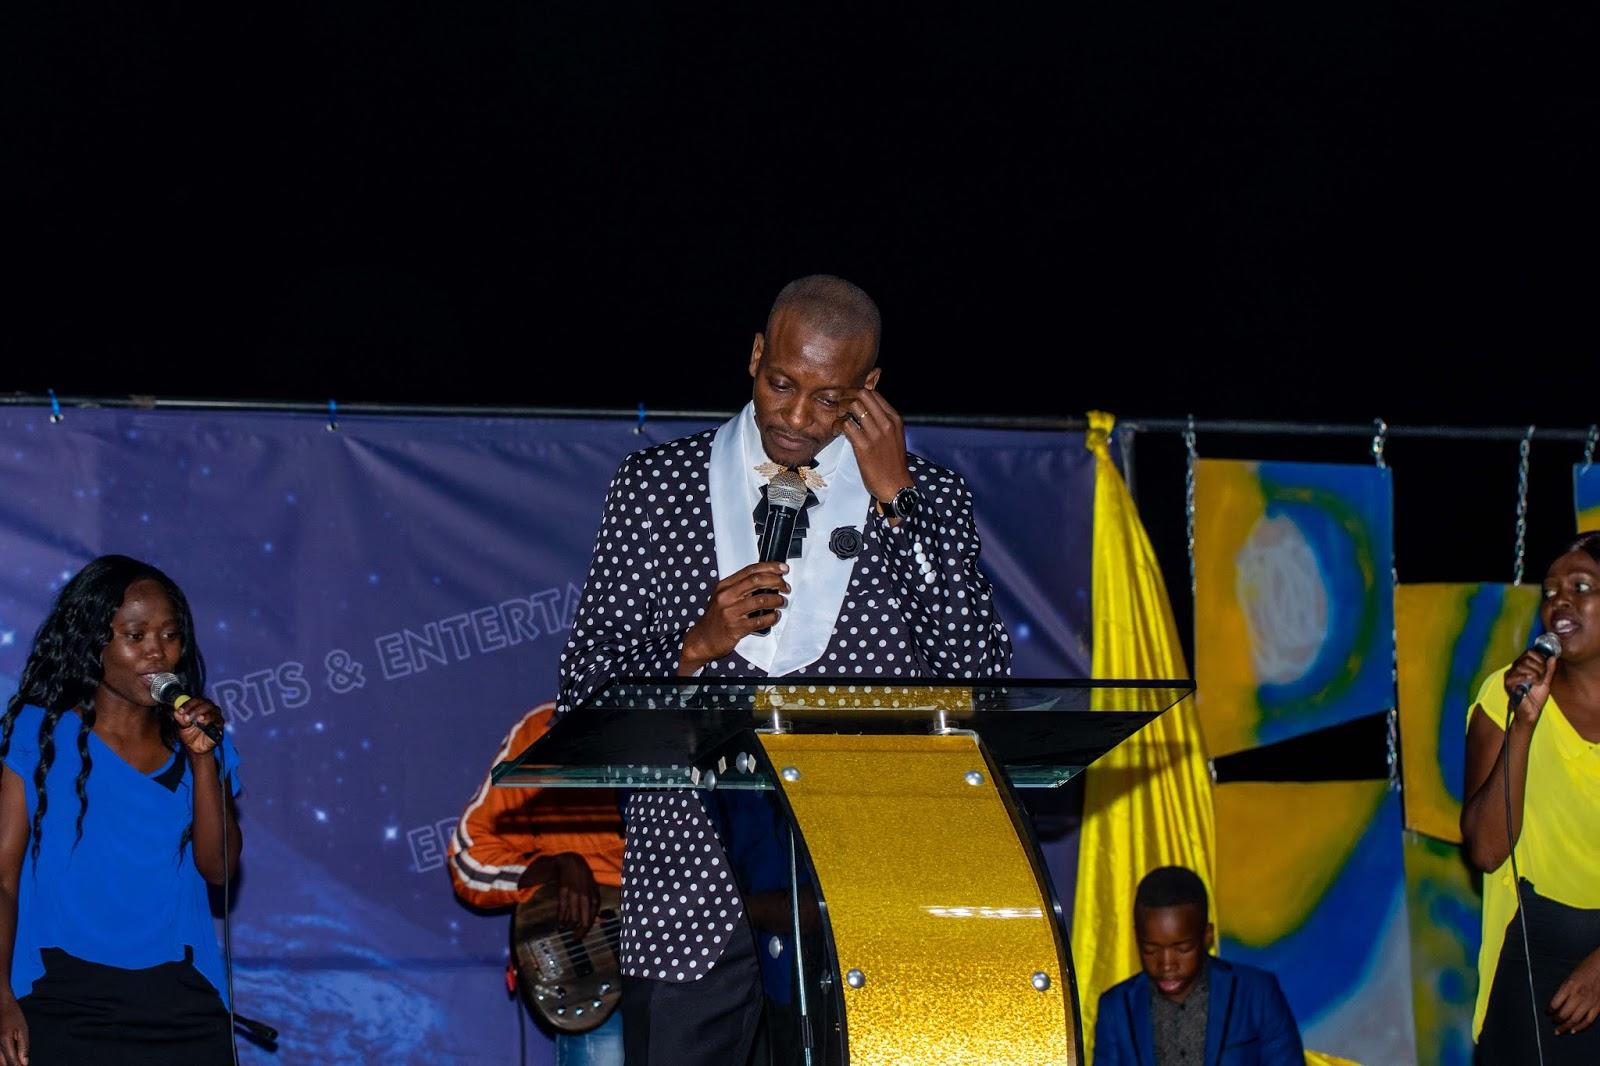 Apostle Pride Sibiya and Overseer Maxwell Chinoruma On Tiyambuke 2018 Day One (Monday 3 September 2018 Evening)